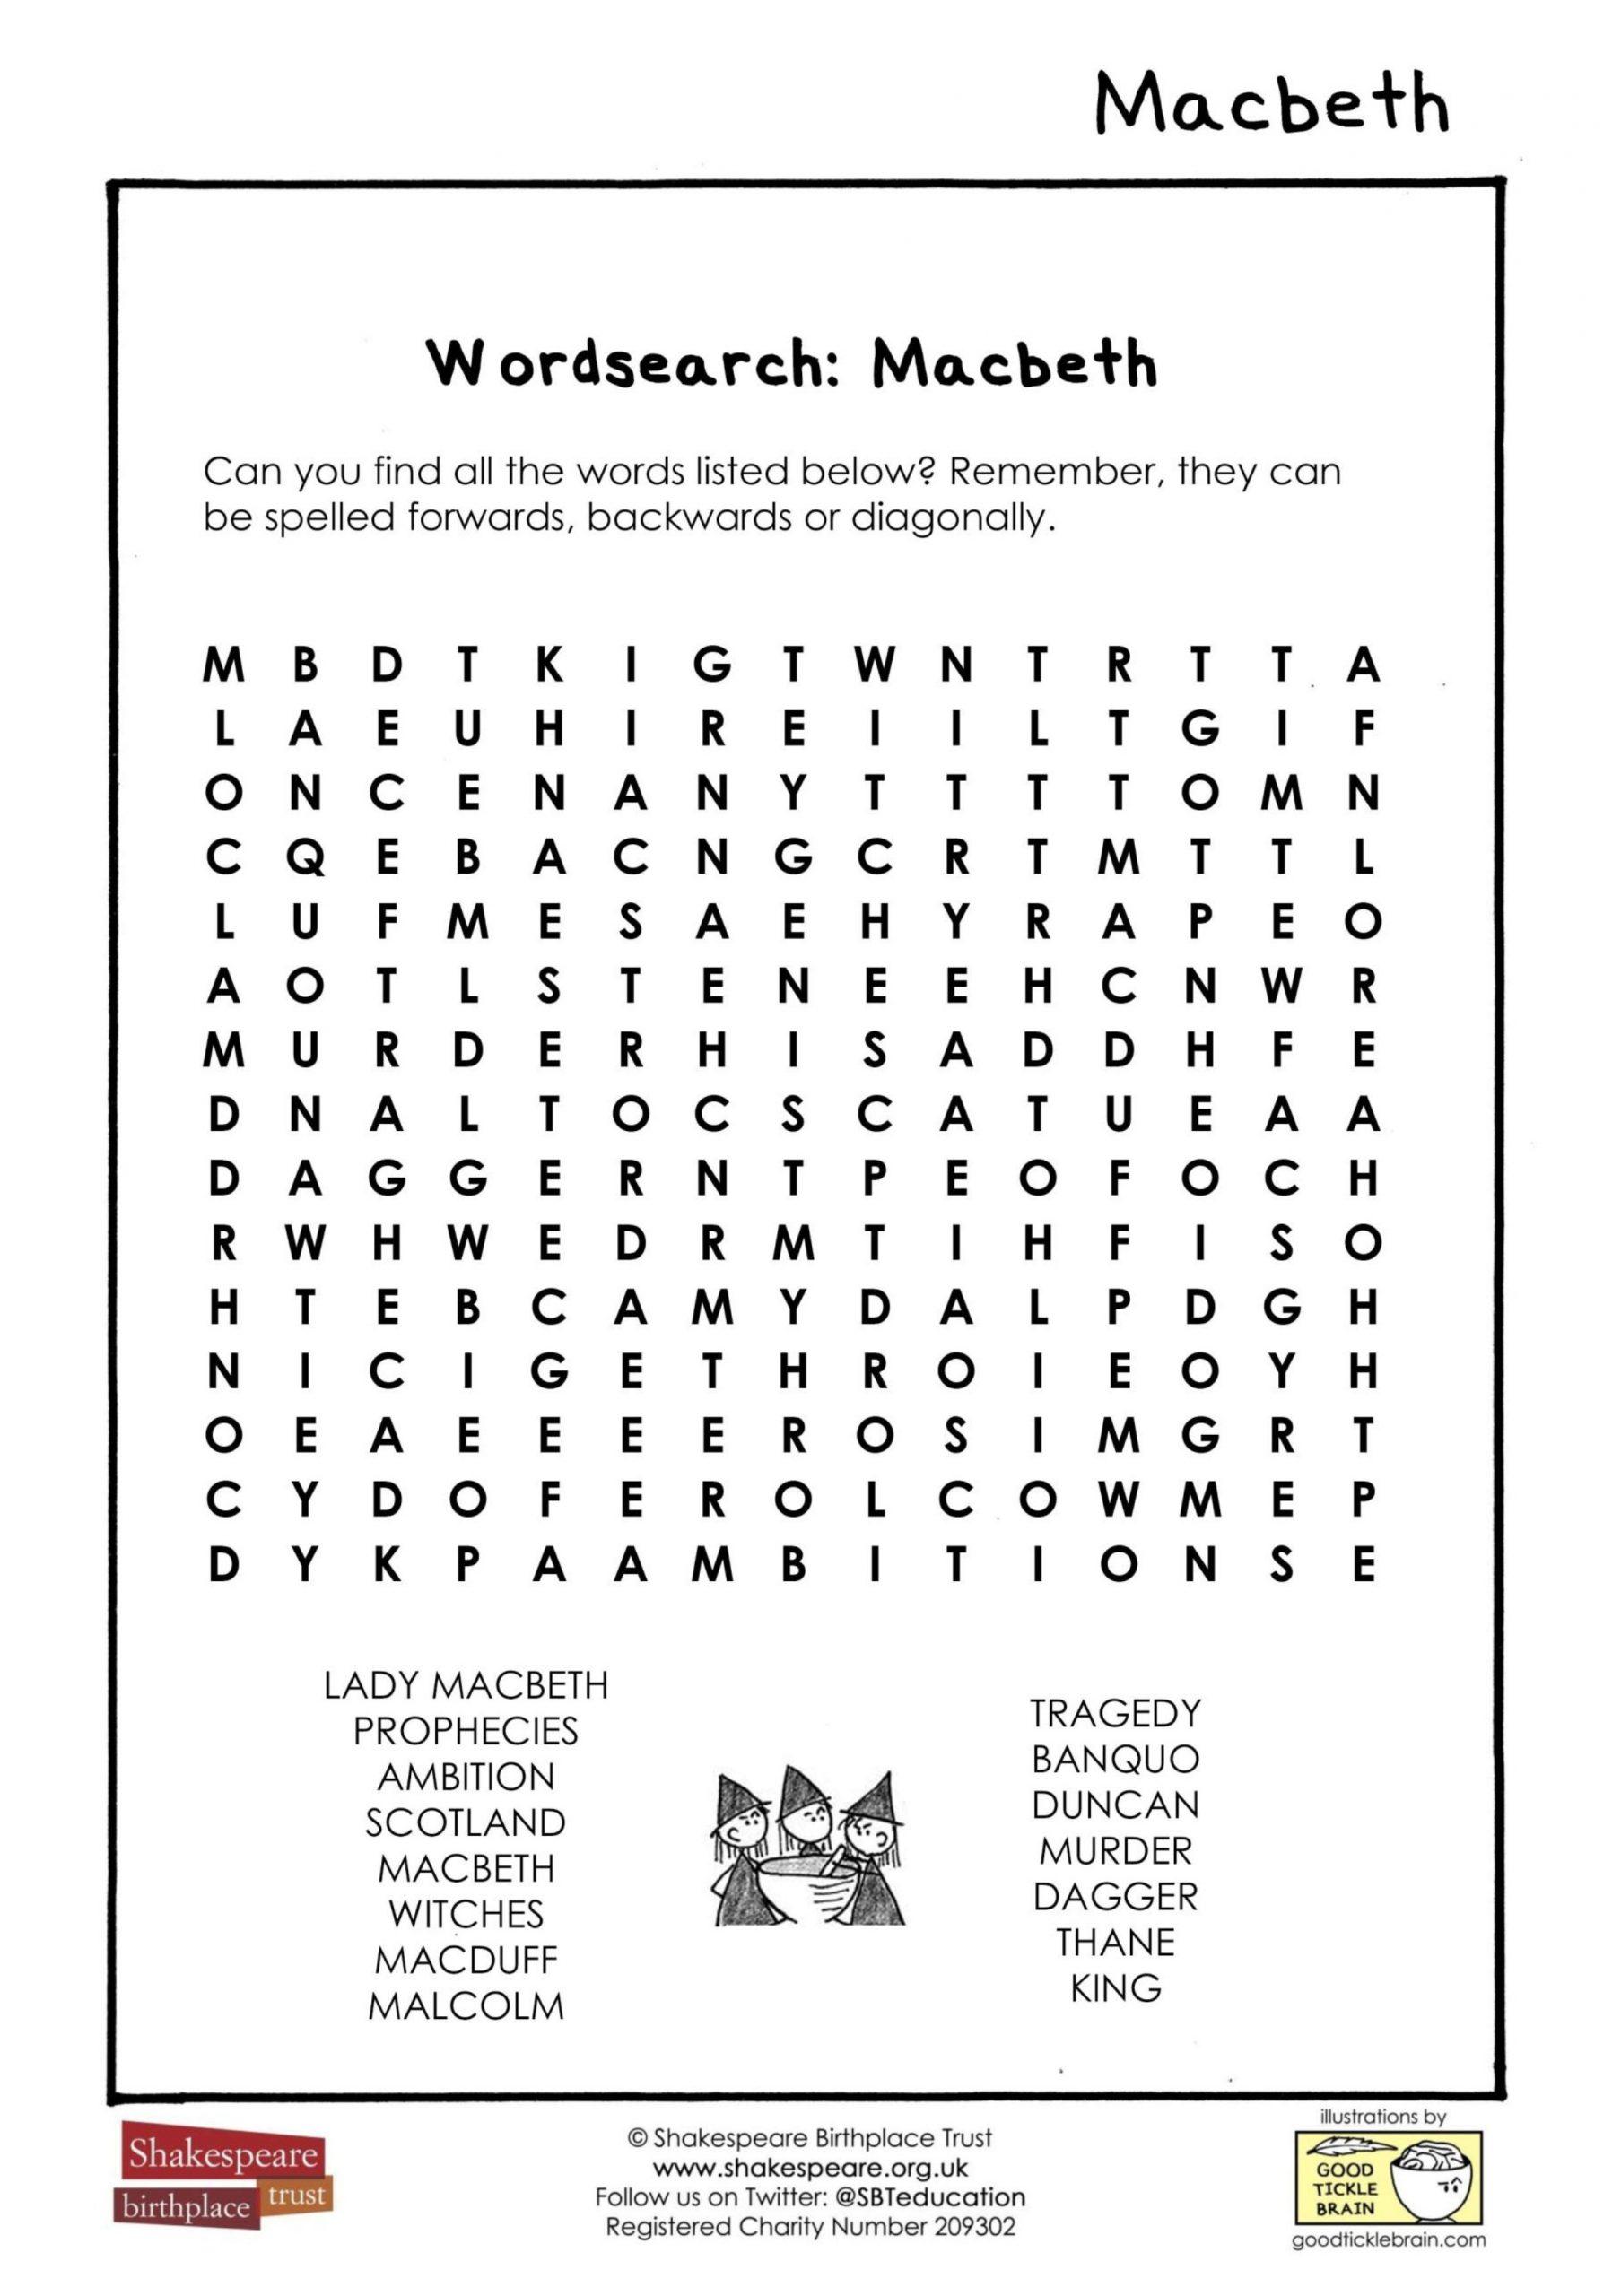 Macbeth Wordsearch